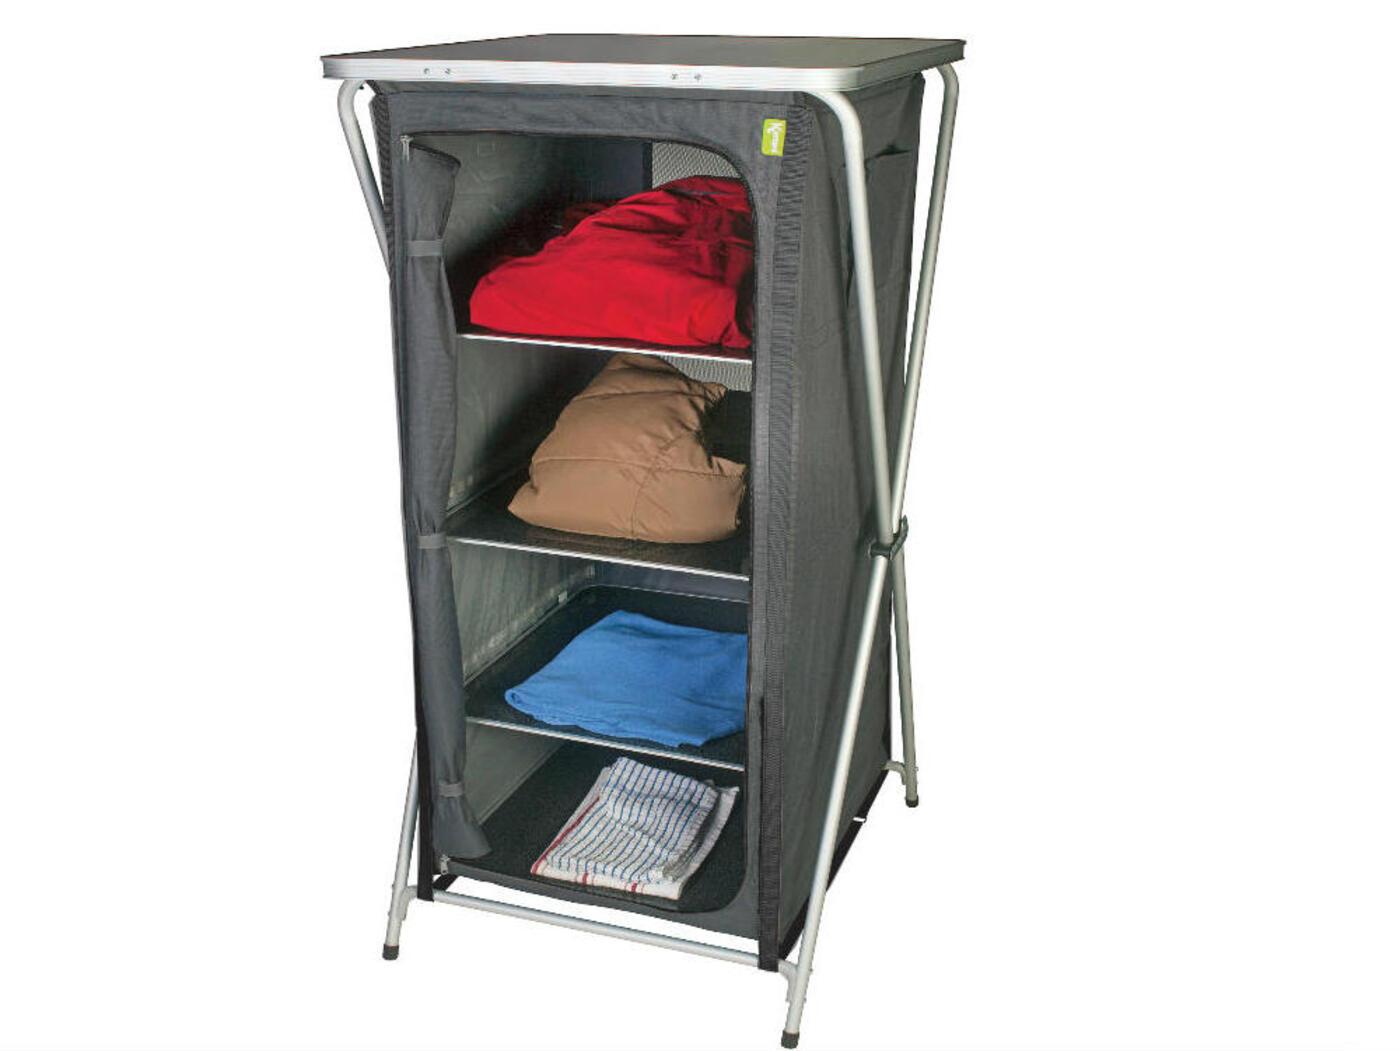 Kampa grace camping cupboard larder homestead caravans for Furniture xpress